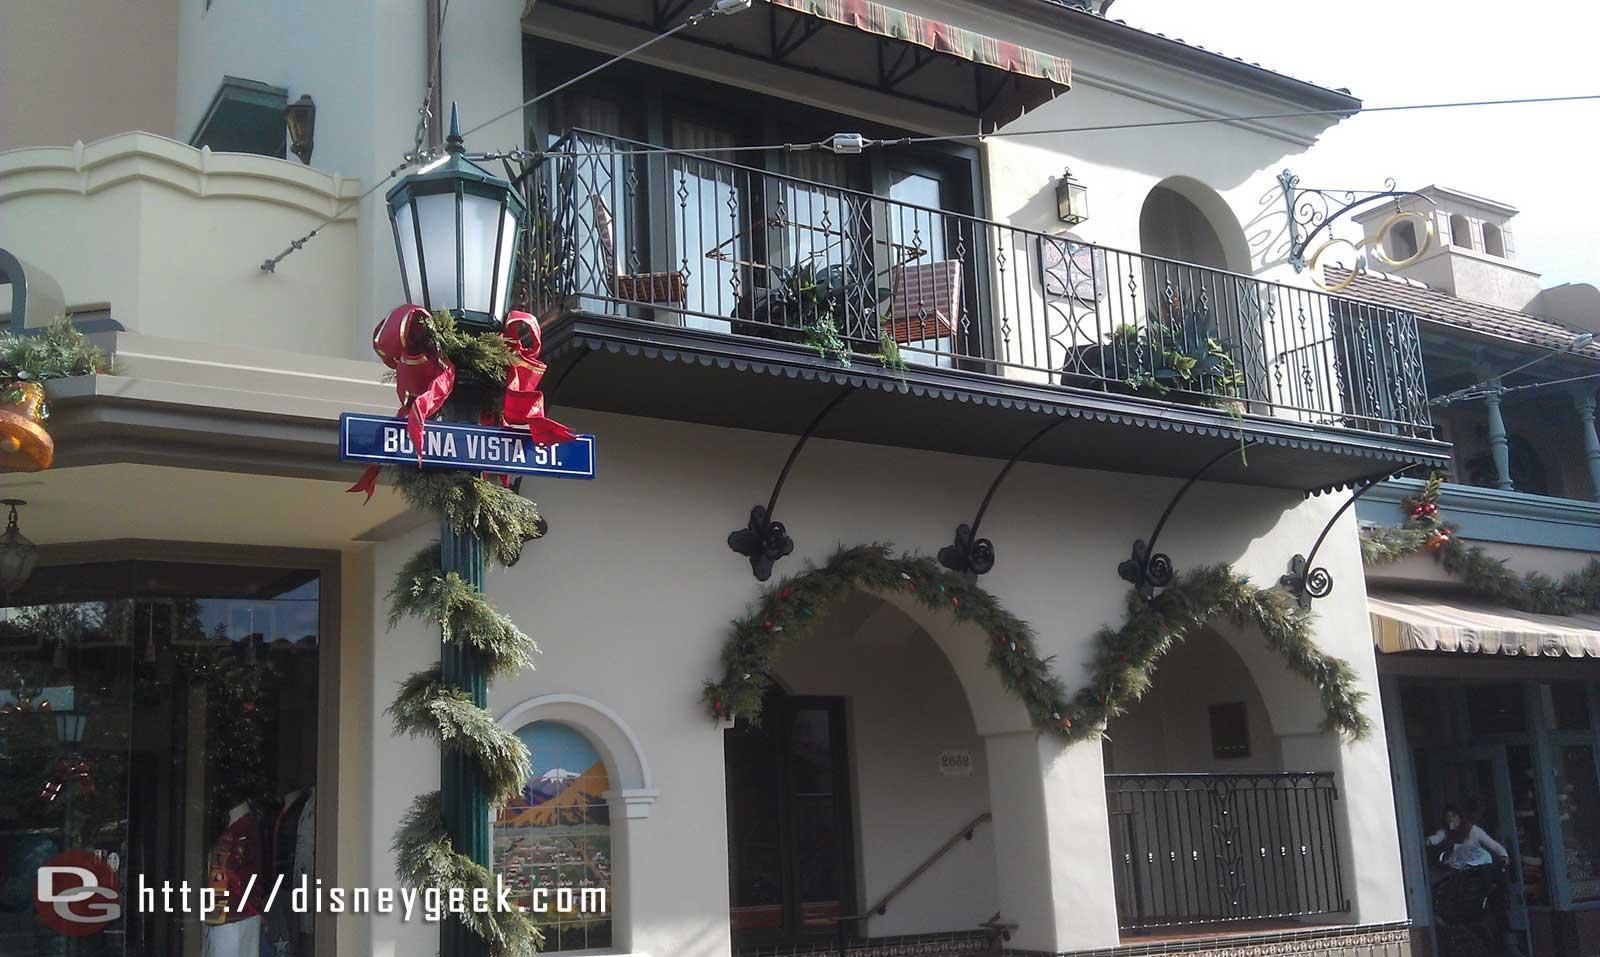 Stepping onto #BuenaVistaStreet to start my afternoon at the #Disneyland Resort